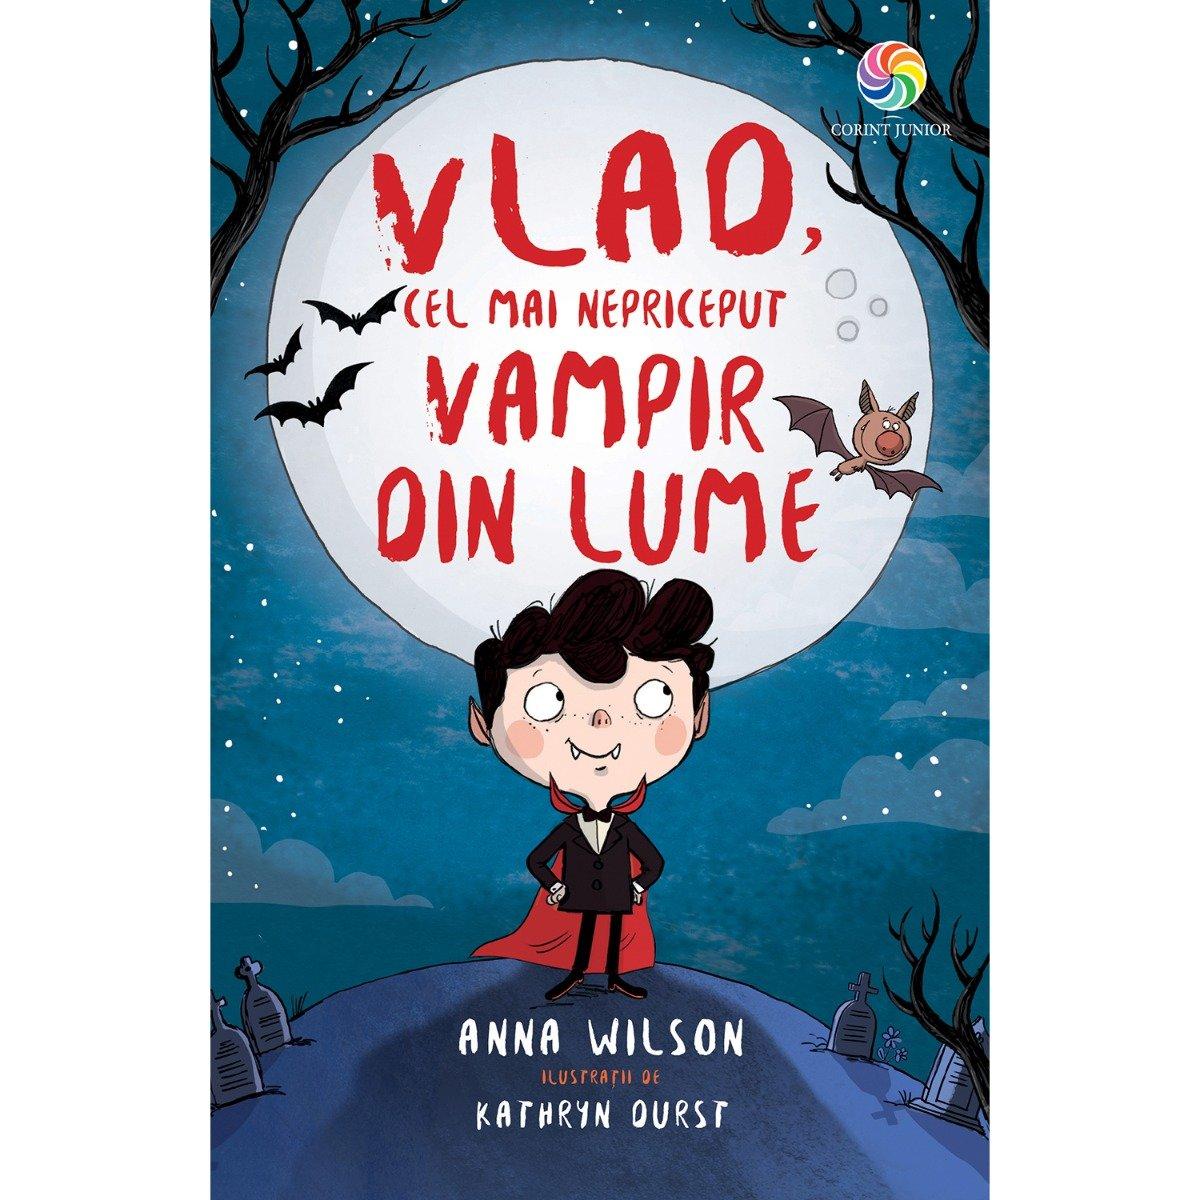 Carte Editura Corint, Vlad, cel mai nepriceput vampir din lume, Anna Wilson